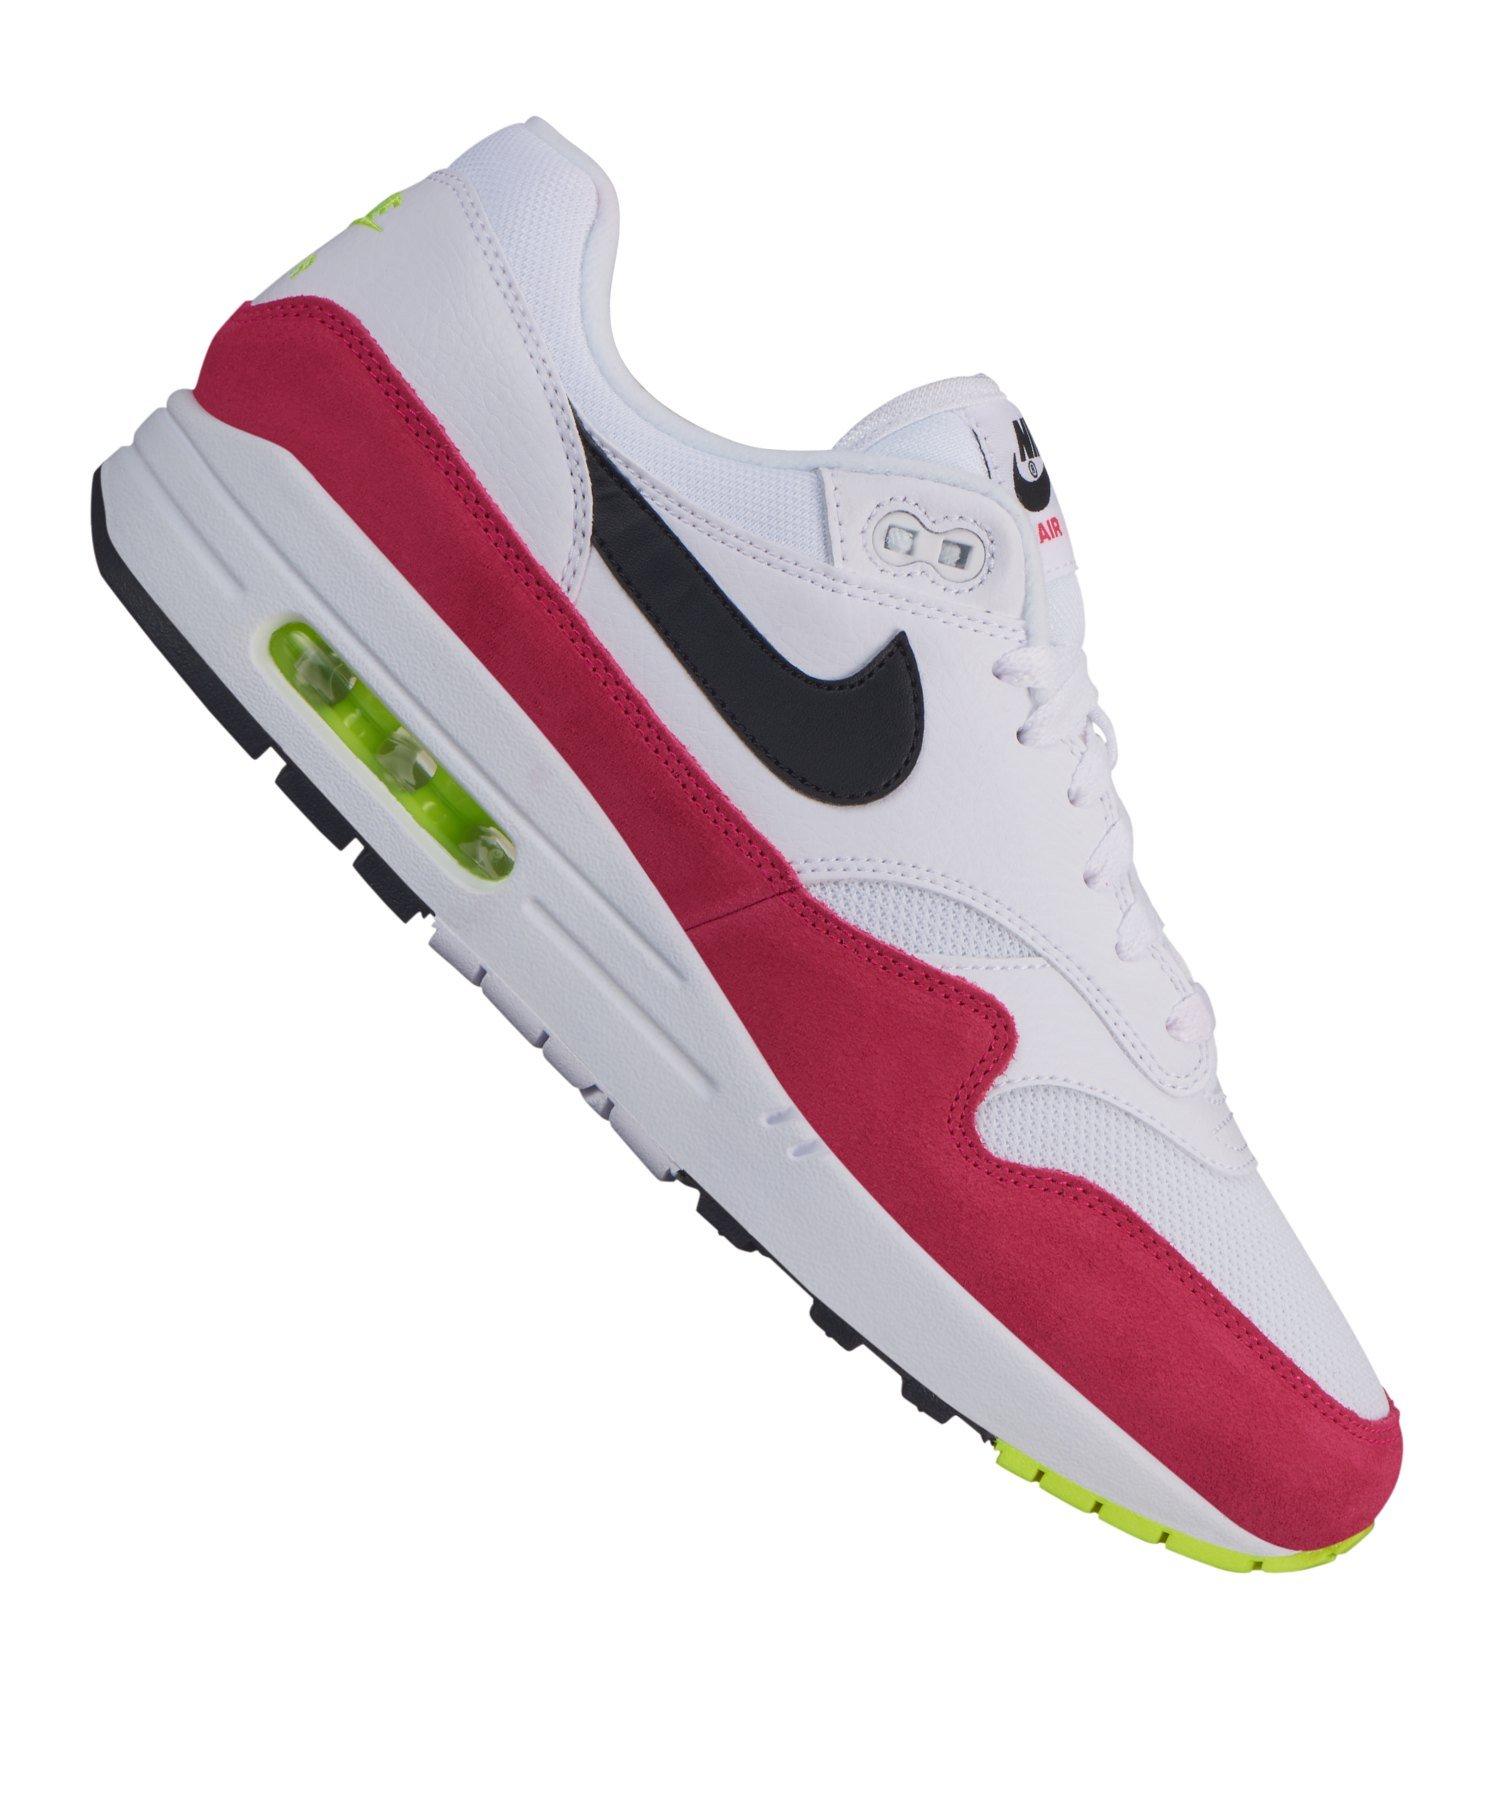 pretty nice 0eb37 63c09 Nike Air Max 1 Sneaker Weiss Rot Schwarz F111 - Weiss